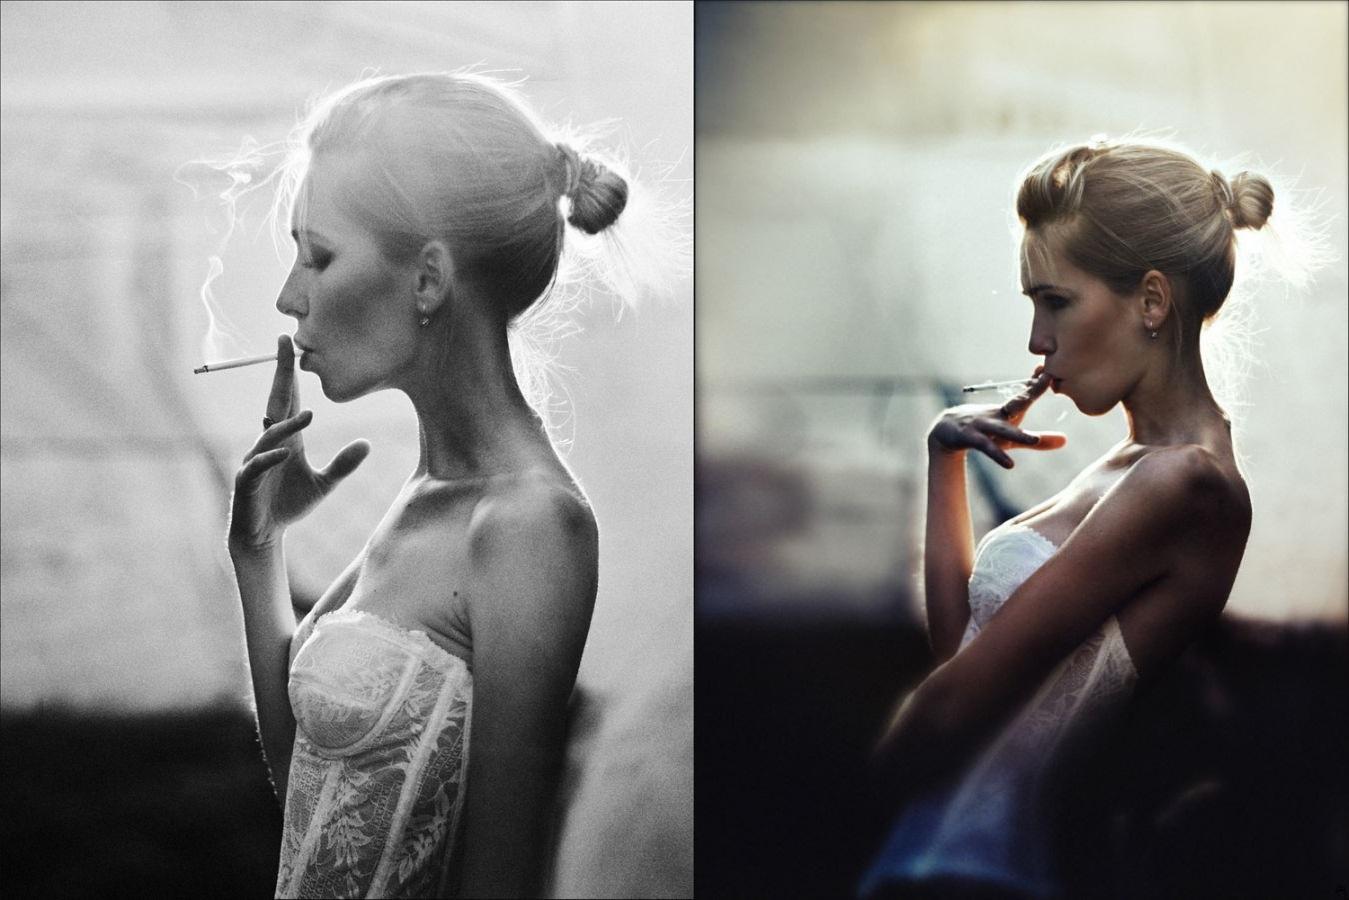 Black, grey, and white: Pensive photography art by Evgeniya Rudaya - 04